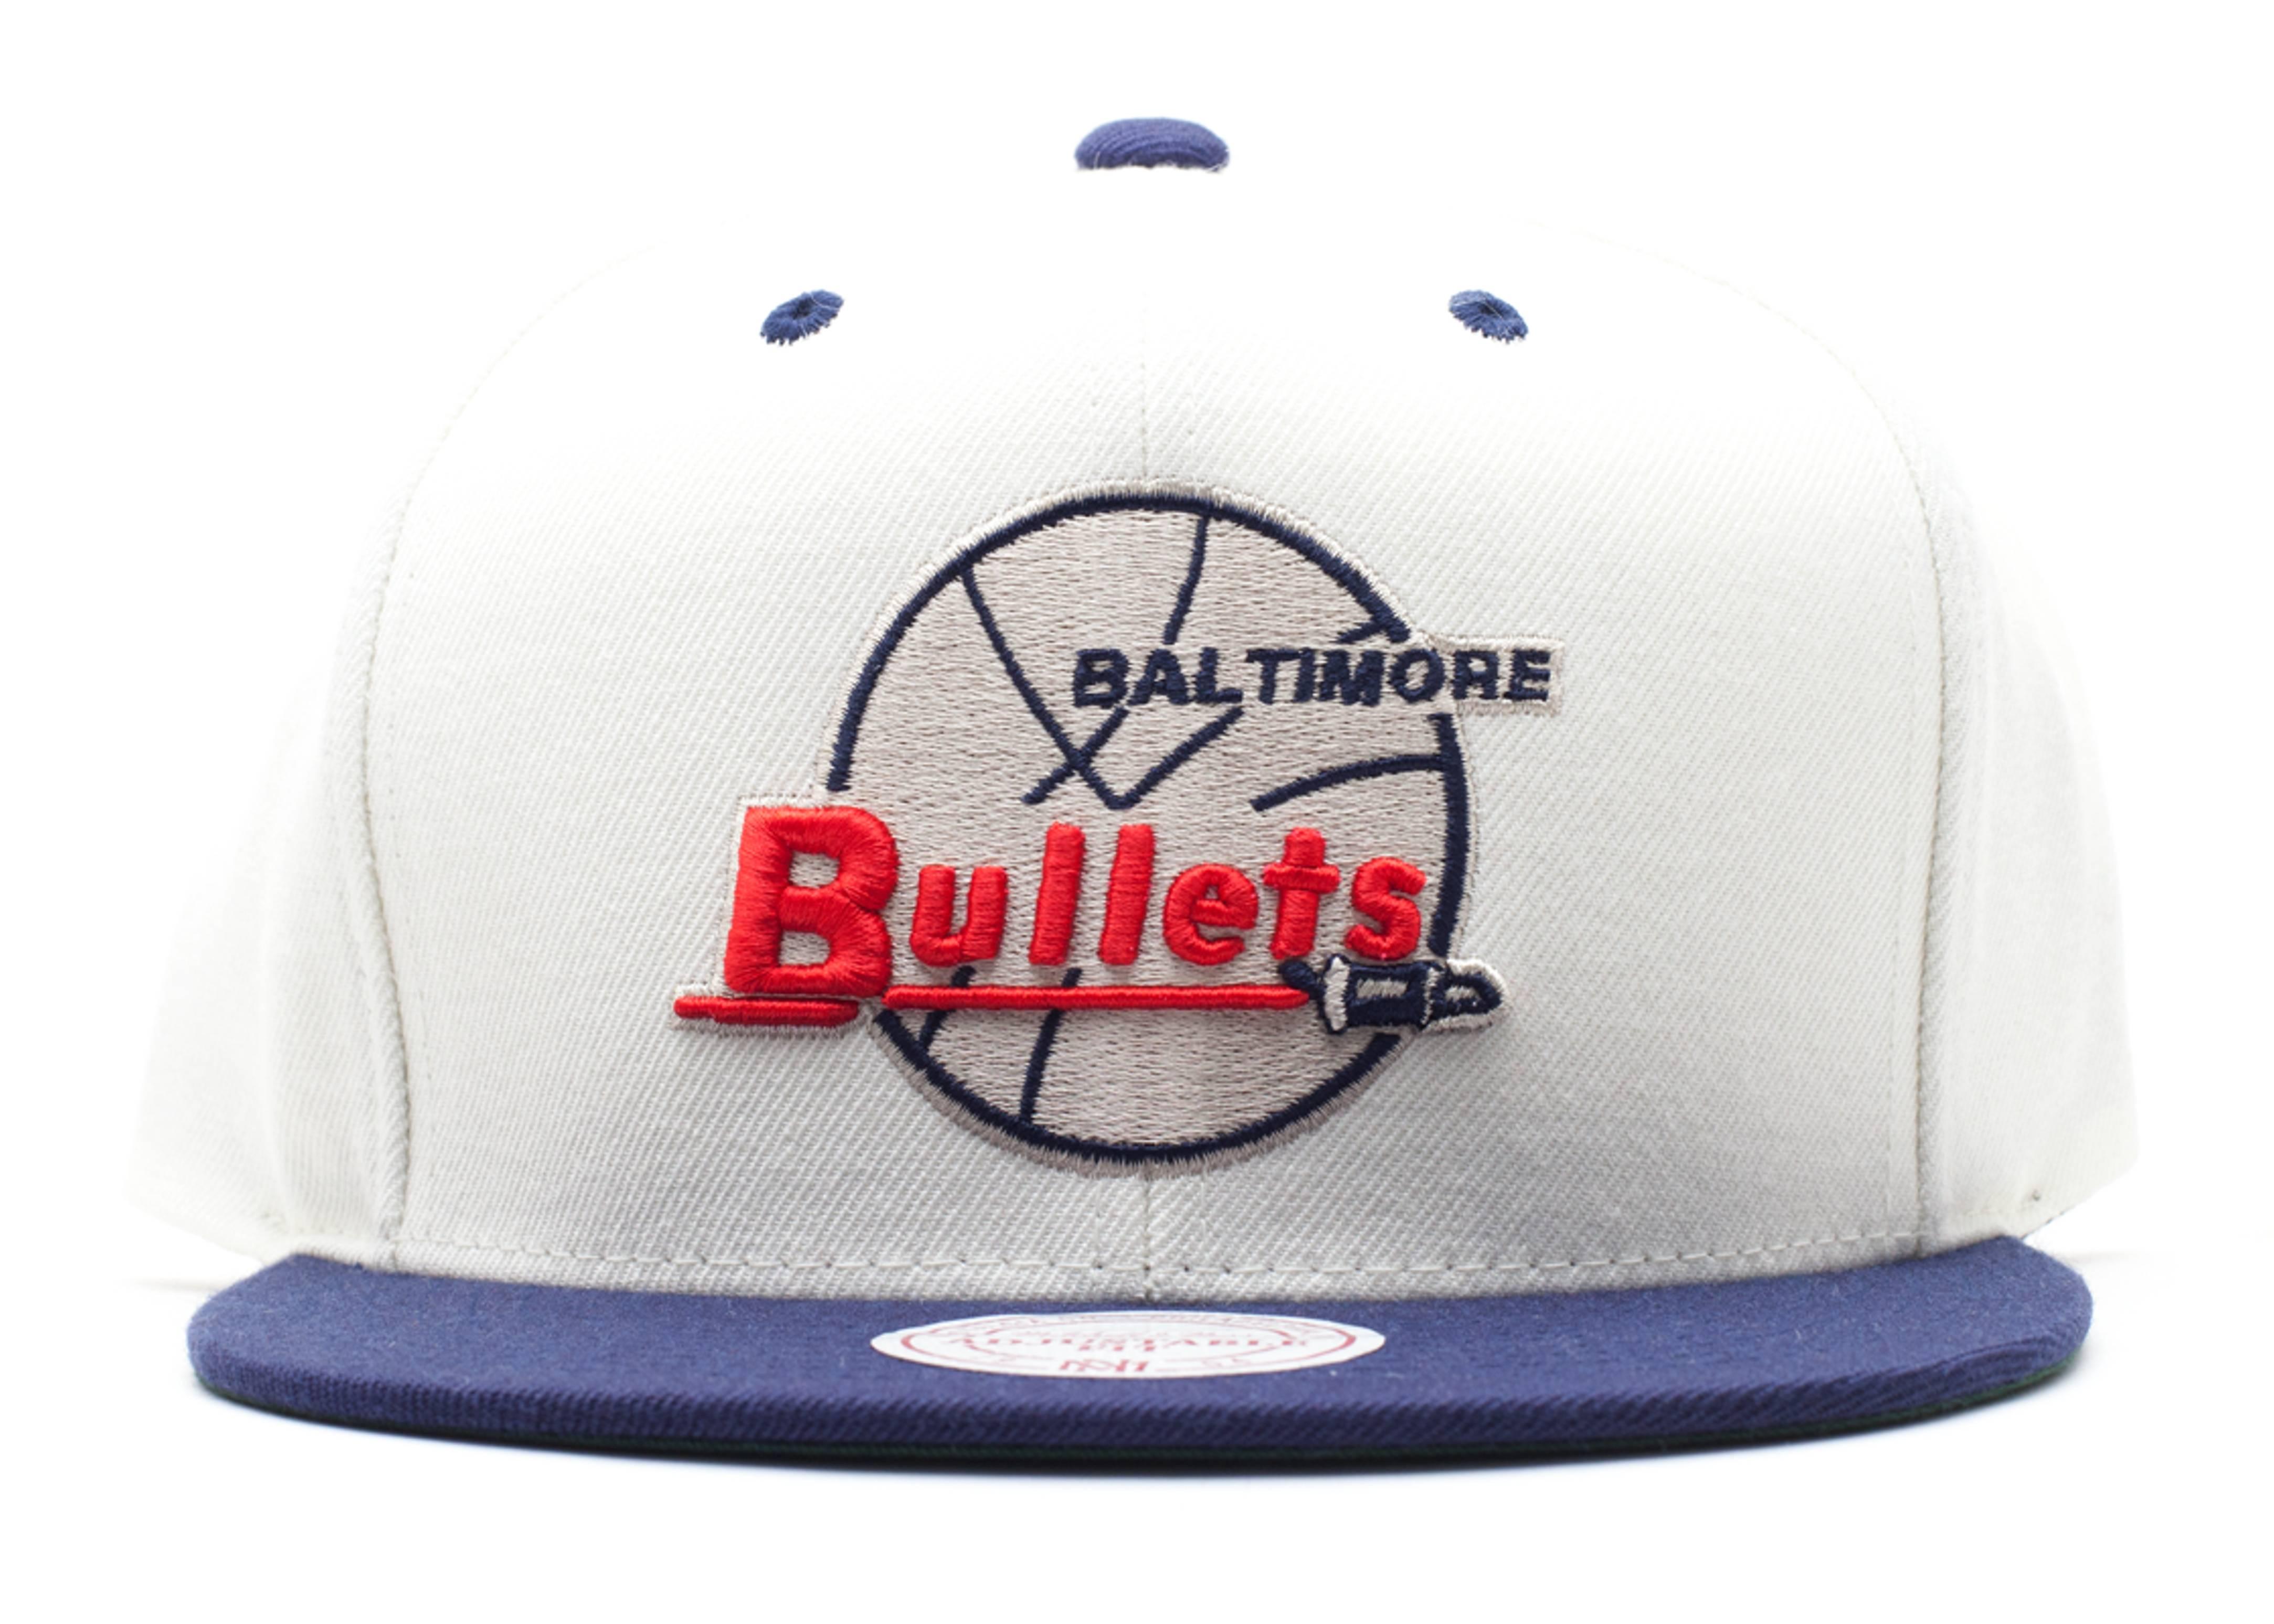 baltimore bullets velcro-strap